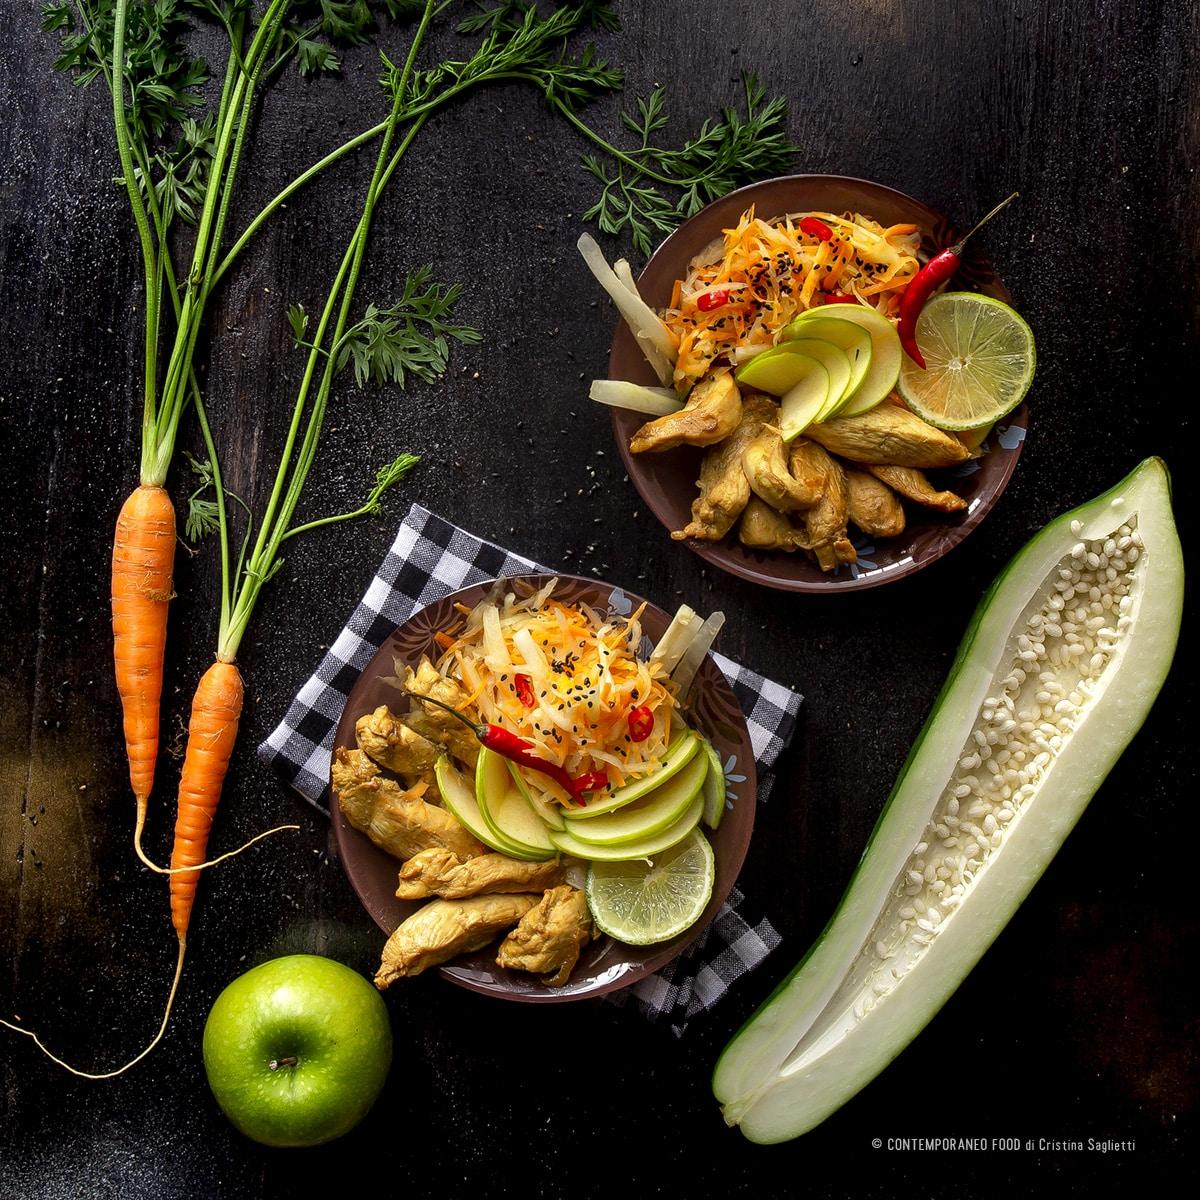 insalata-di-papaya-verde-mela-verde-carote-pollo-ricetta-light-dieta-facile-1-contemporaneofood